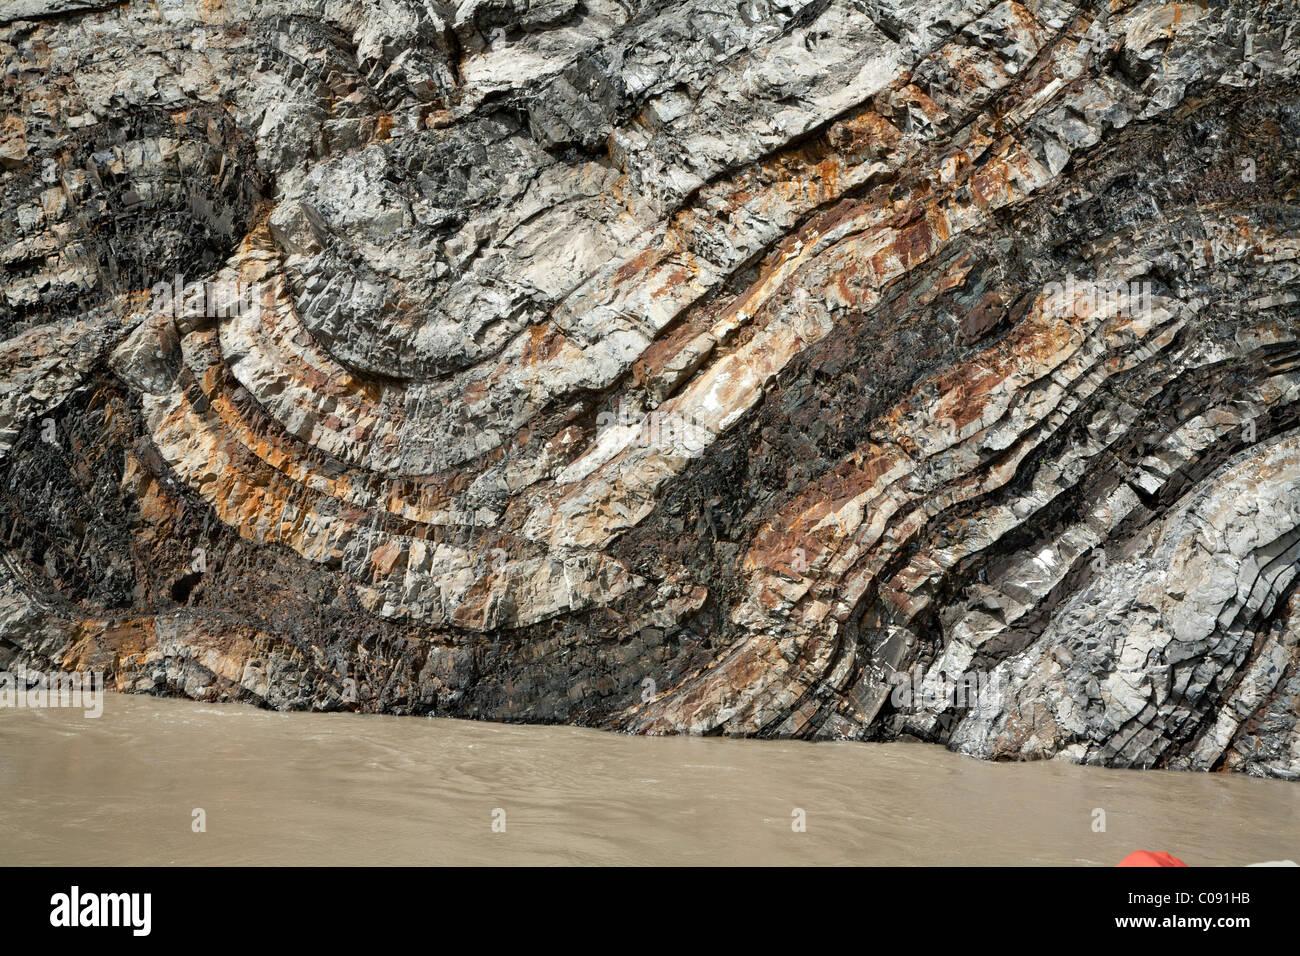 Nahaufnahme von Calico bluff entlang dem Yukon River im Yukon-Charley Rivers National Preserve, innen Alaska, Sommer Stockbild